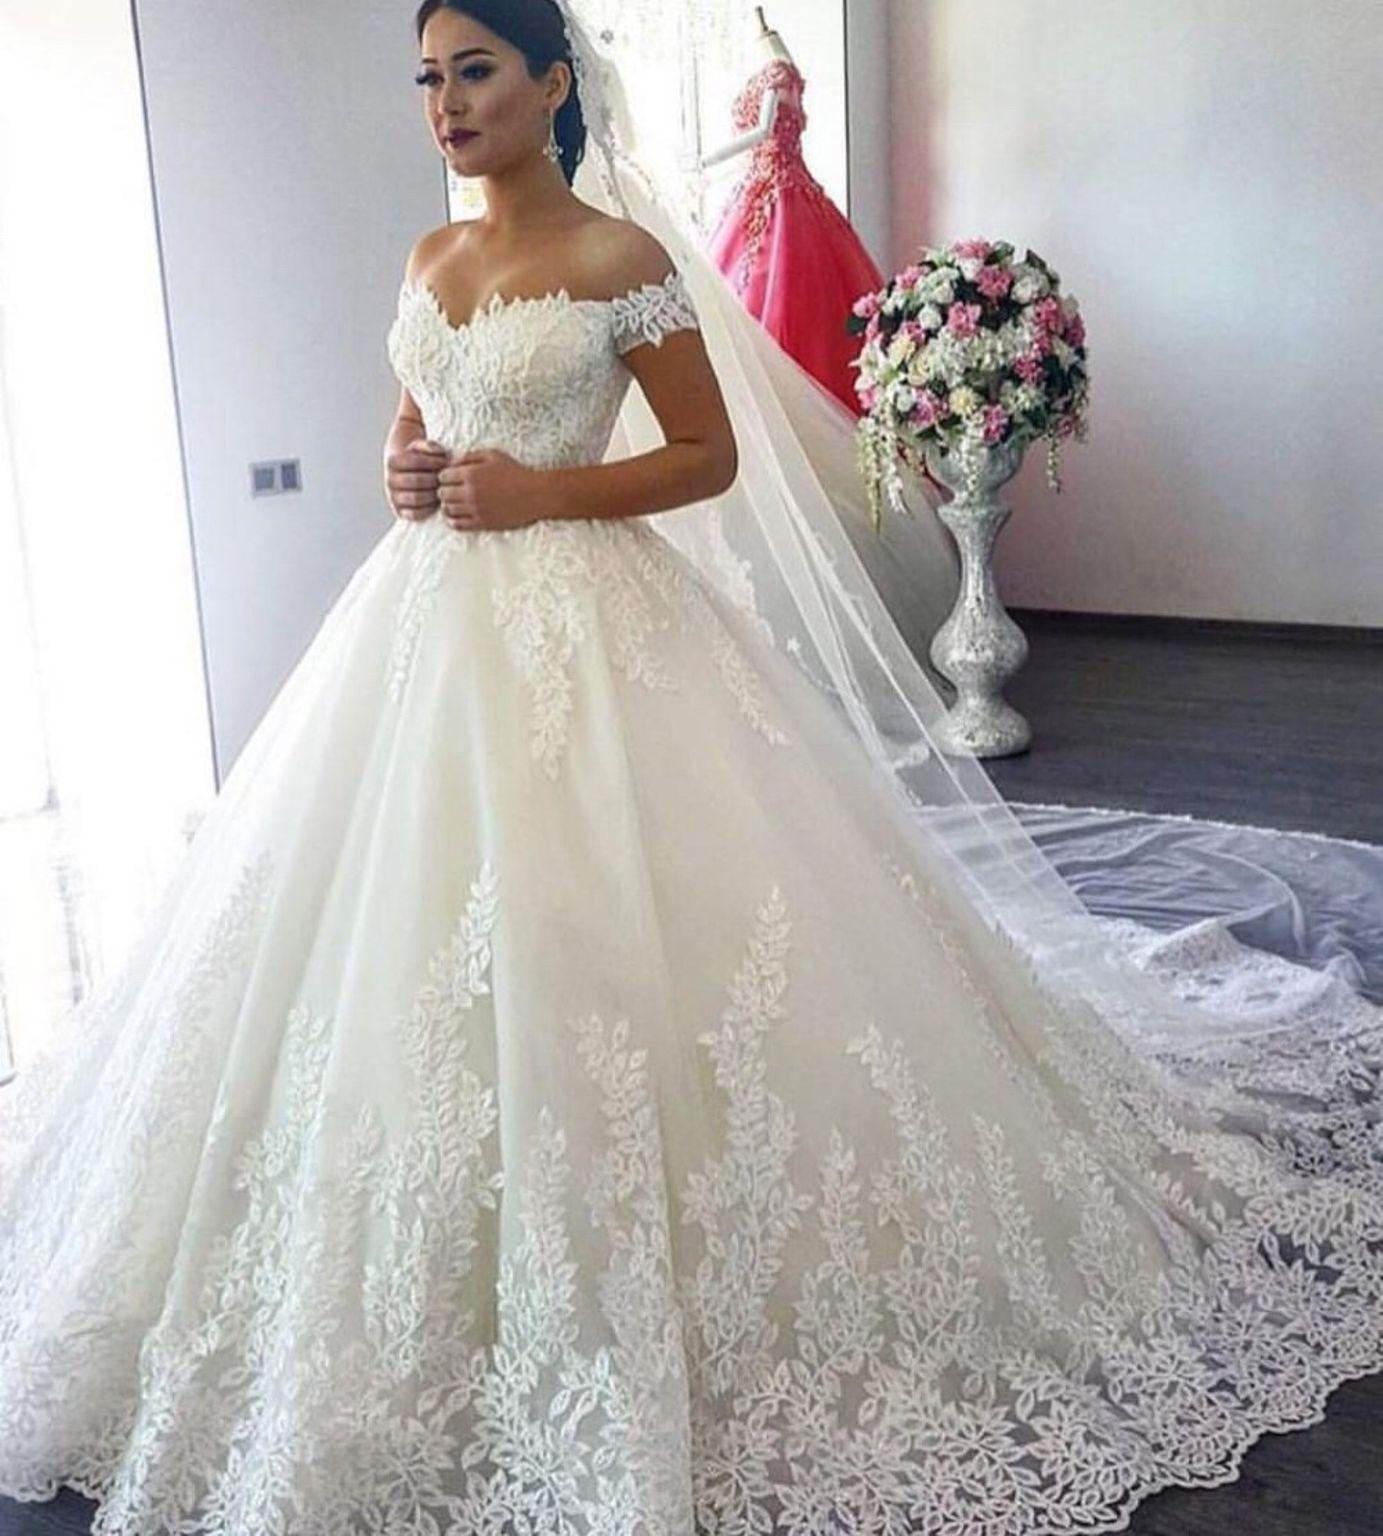 2019 Luxo Lace vestido de Baile Vestidos de Casamento Fora Do Ombro Varrer Trem Nupcial Vestidos de Noiva com Apliques de Renda Princesa Plus Size Vestido De Casamento